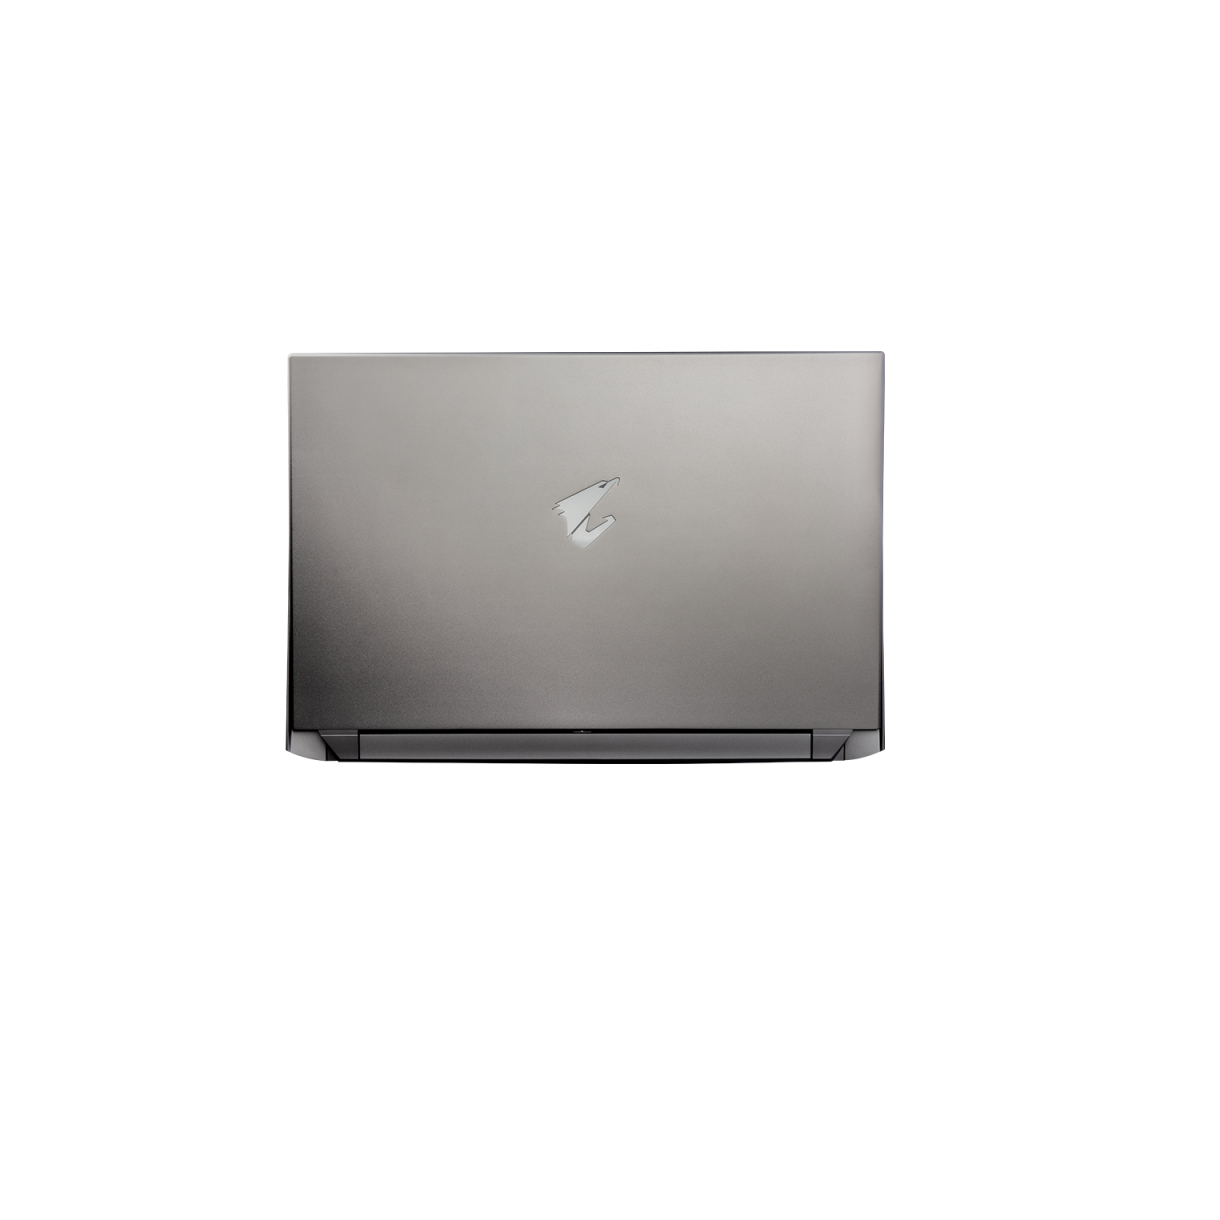 VivoBook 15_X512_8B_Peacock Blue